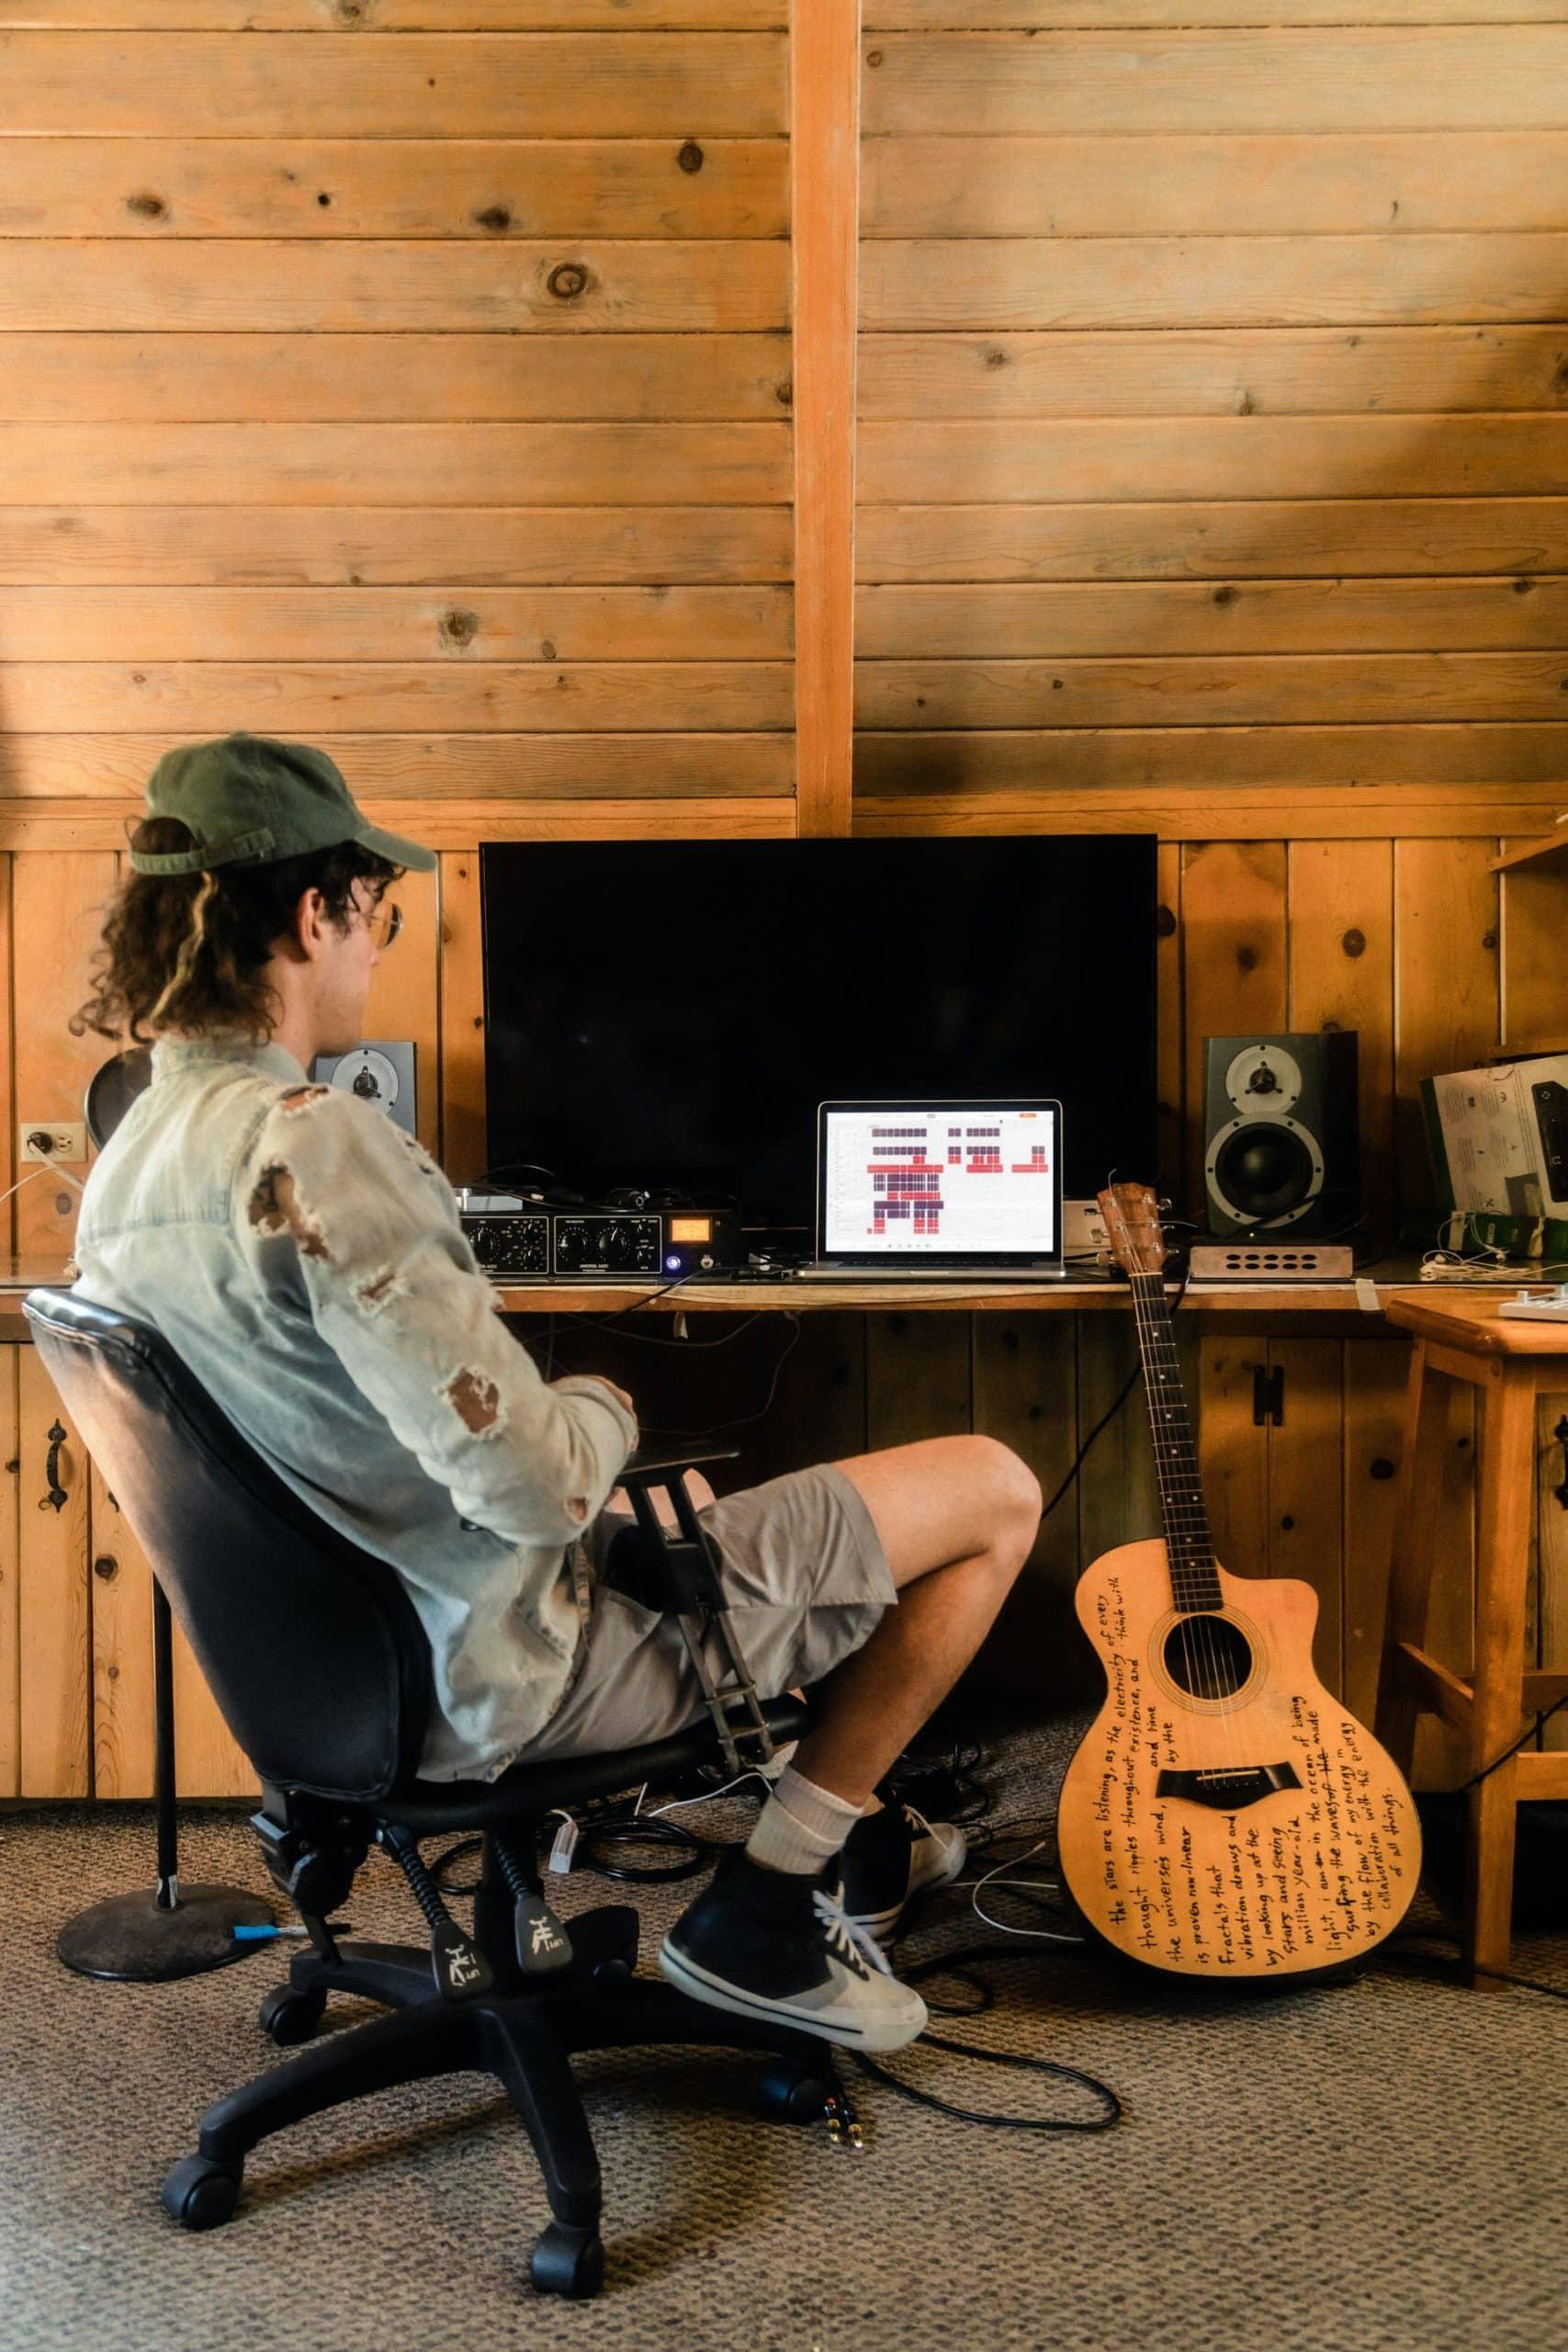 Set Up Home Recording Studio Article Image